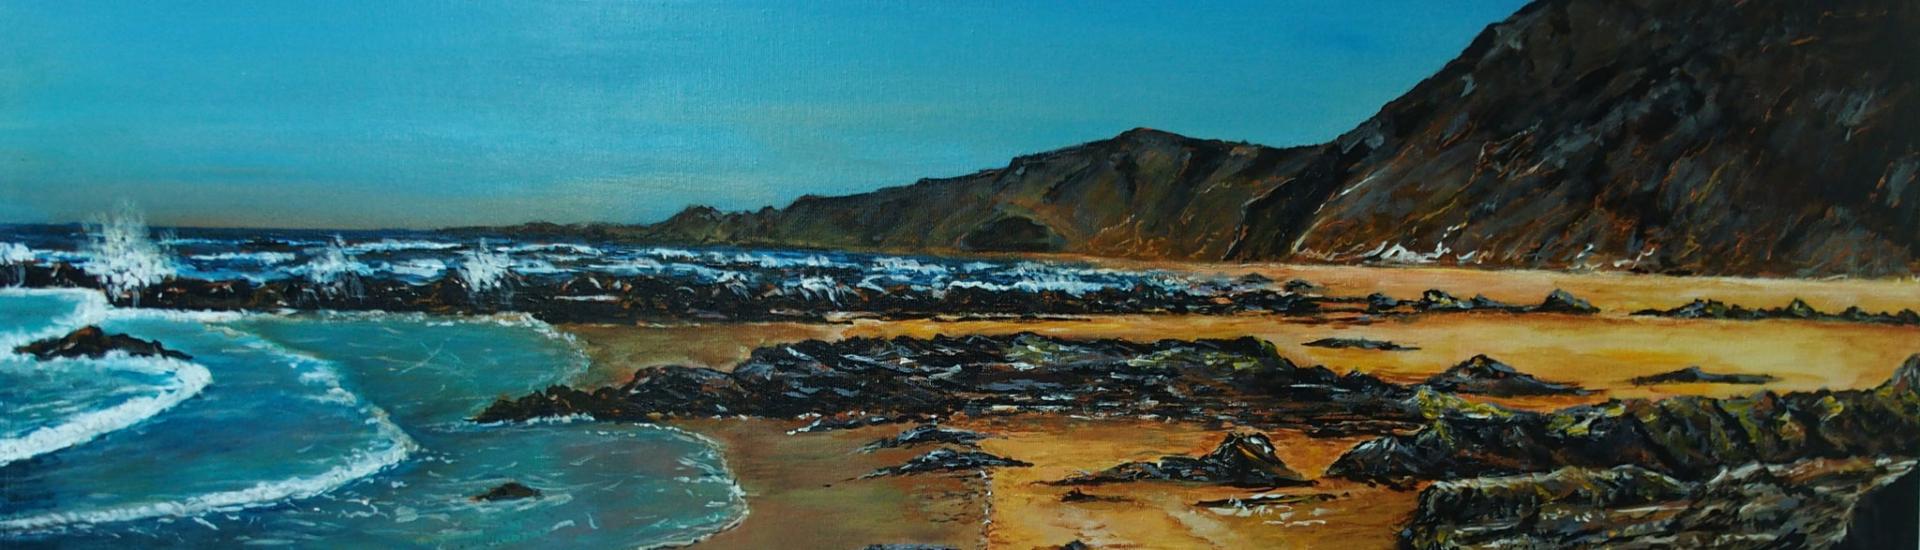 Siegfried Huber - Bild: Atlantikküste Portugal-Strand Castelejo